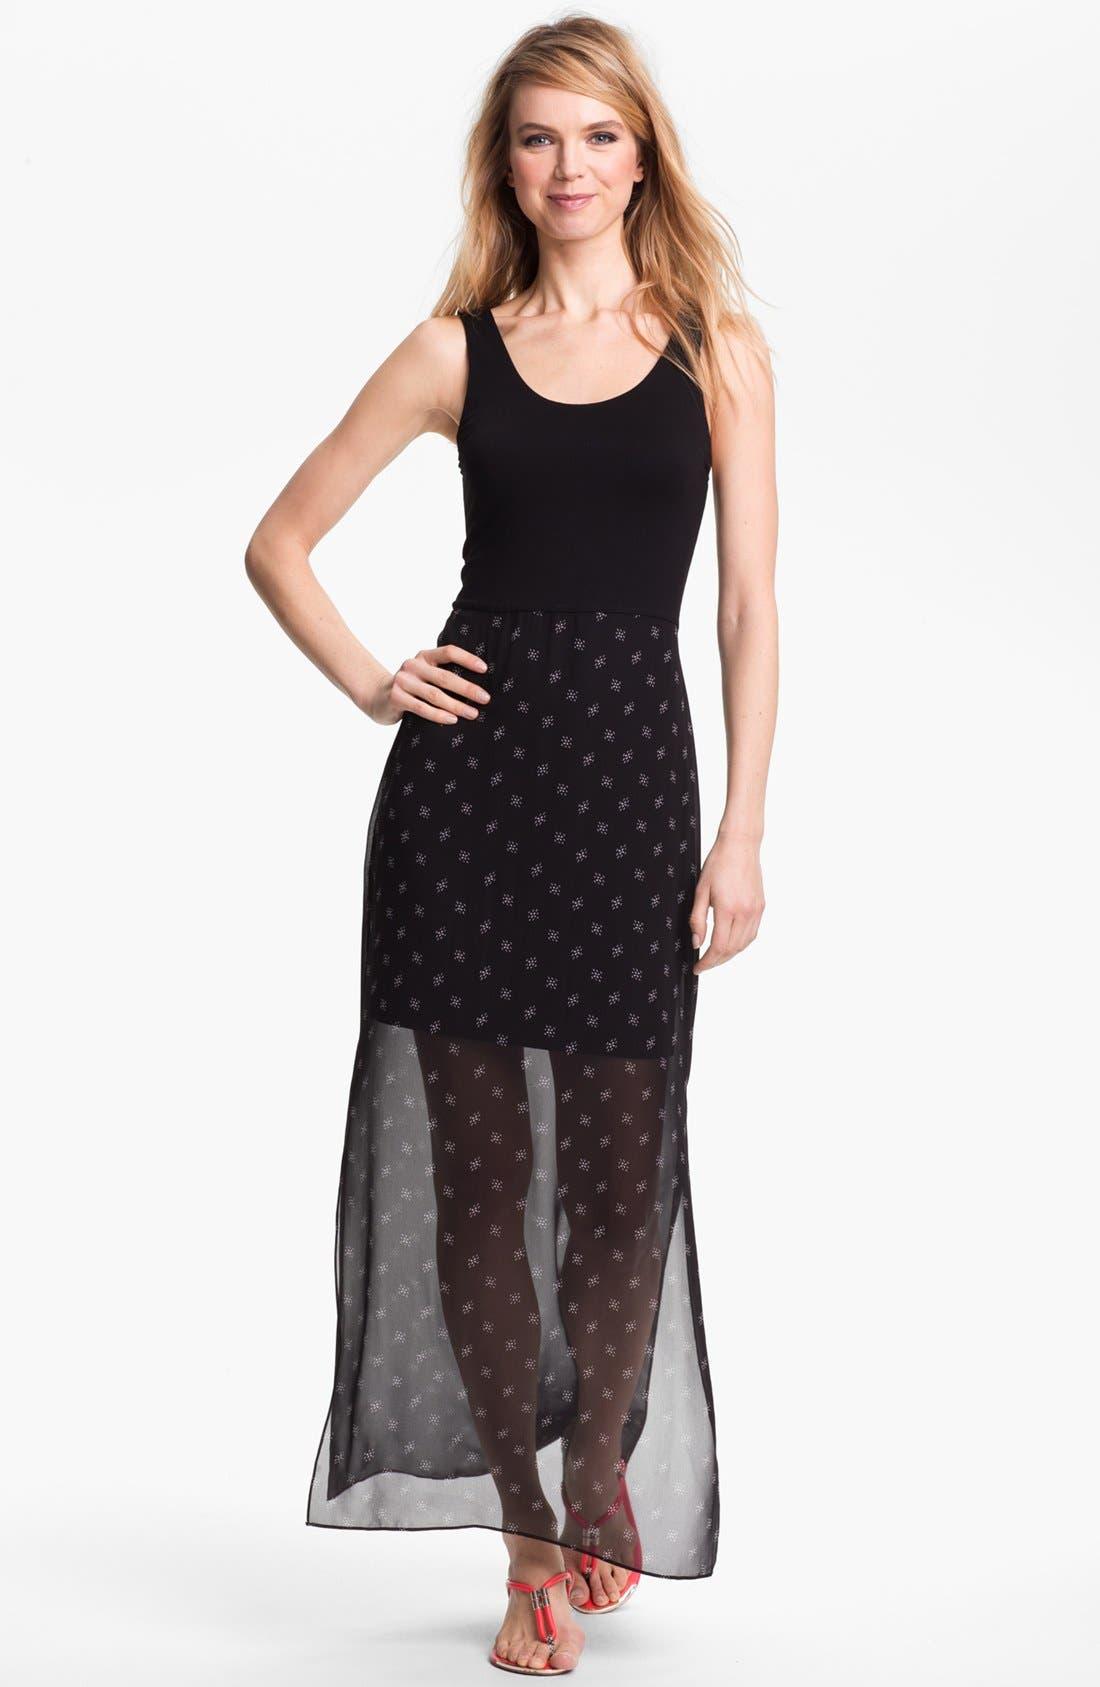 Alternate Image 1 Selected - Vince Camuto Mixed Media Maxi Dress